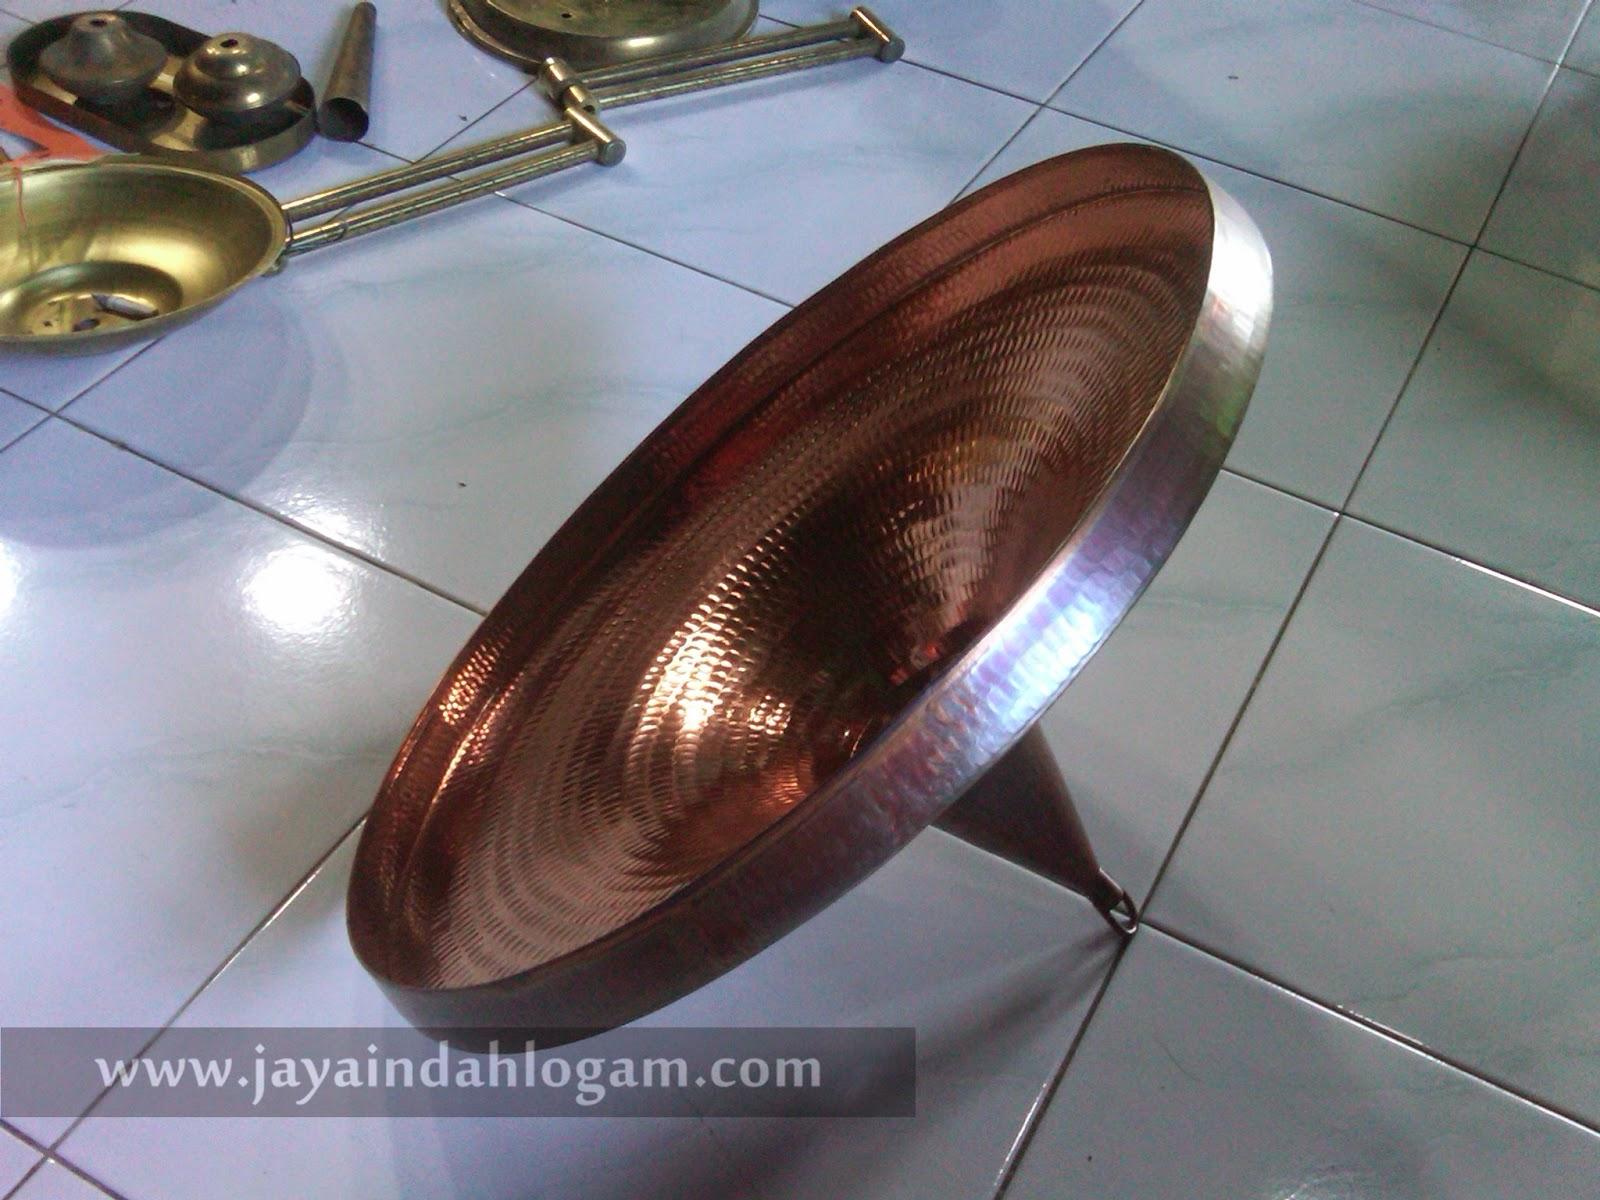 http://www.jayaindahlogam.com/2014/09/kerajinan-tembaga-lampu-gantung.html